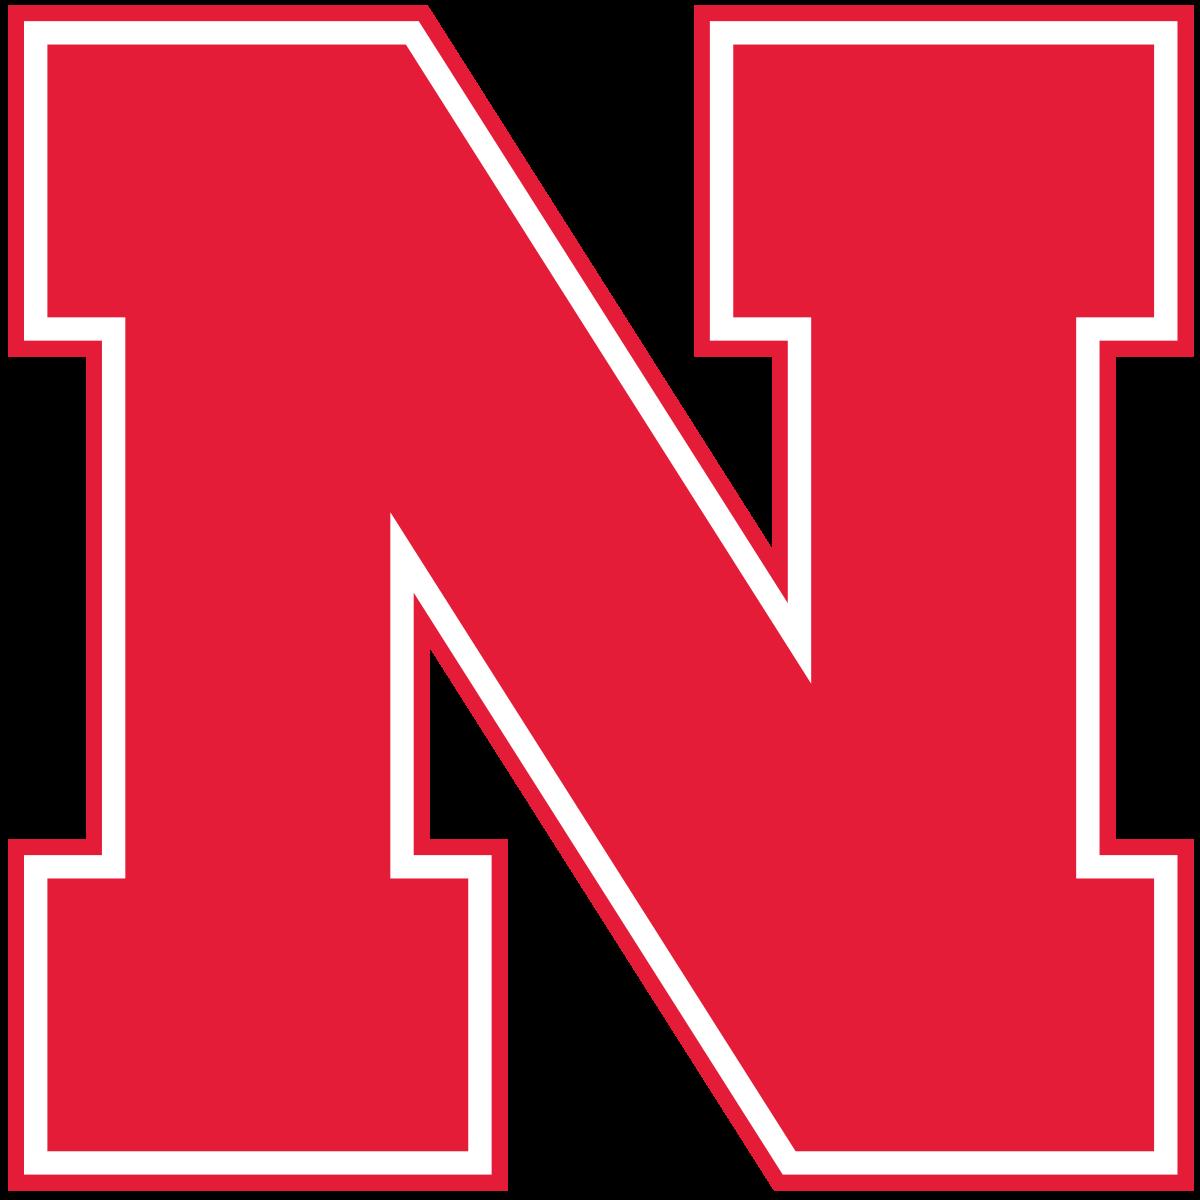 1200px-Nebraska_Cornhuskers_logo.svg